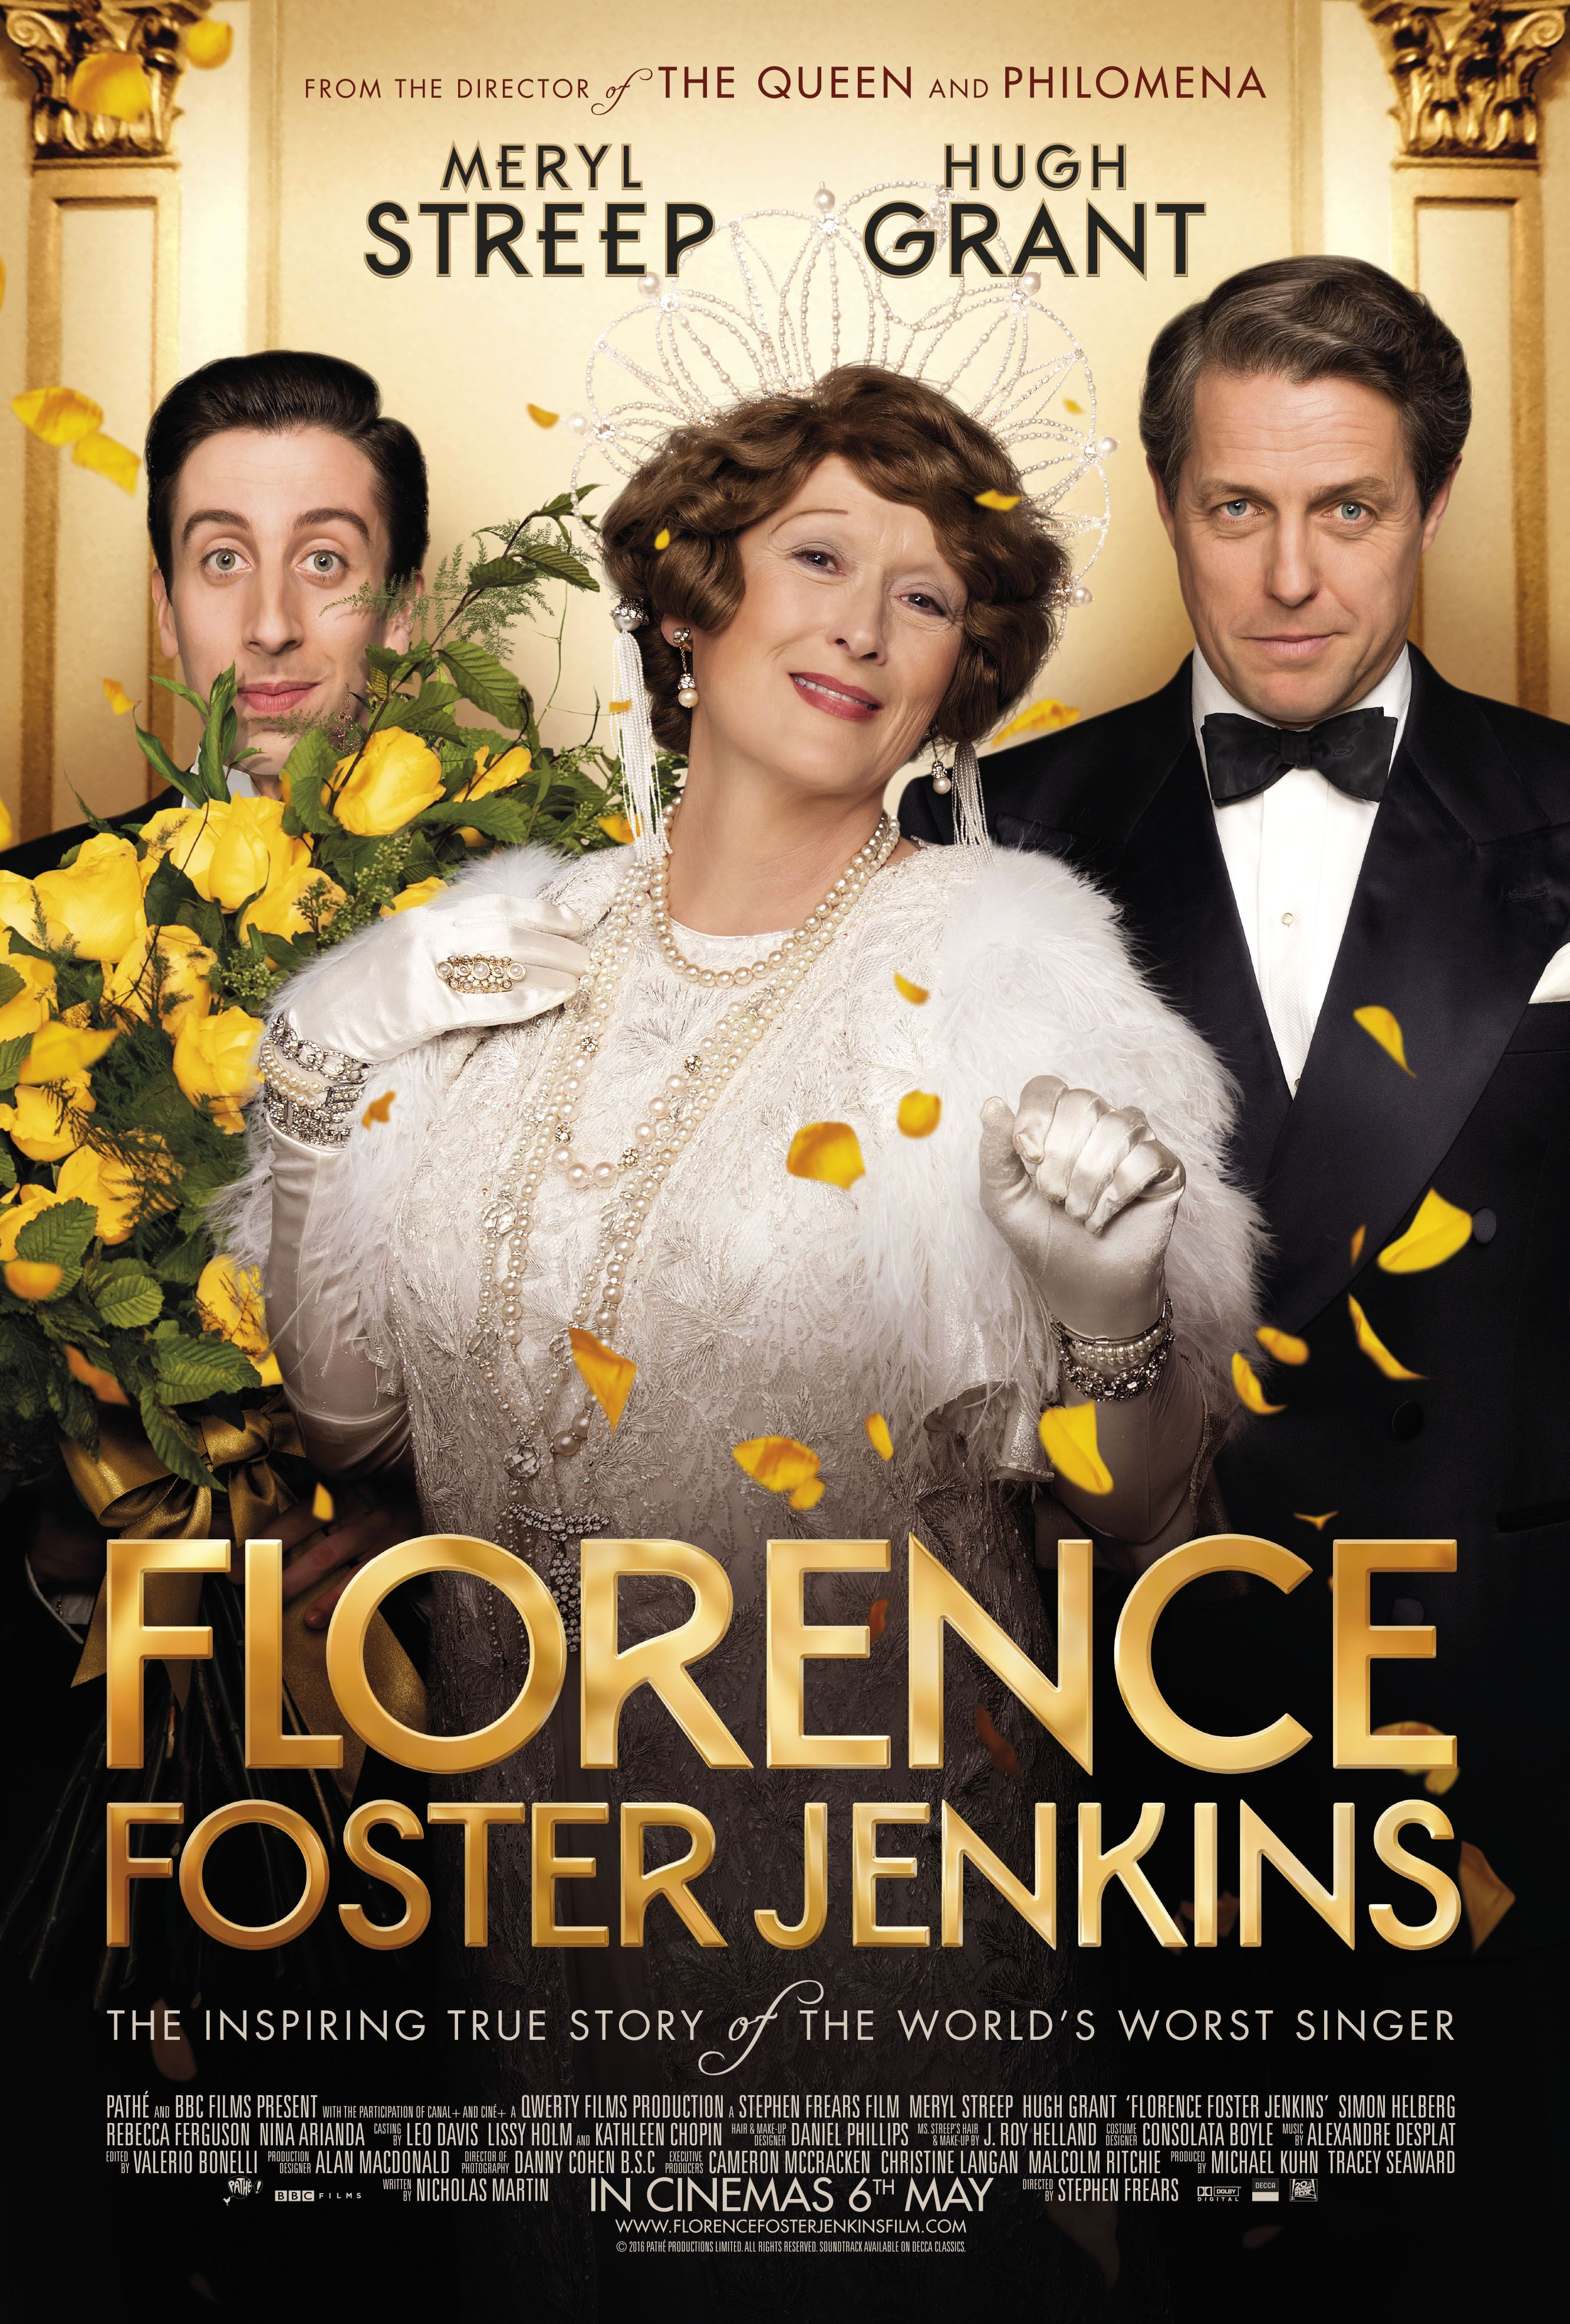 Florence Foster Jenkins/《走音歌后》/Stephen Frears/英國、法國 The